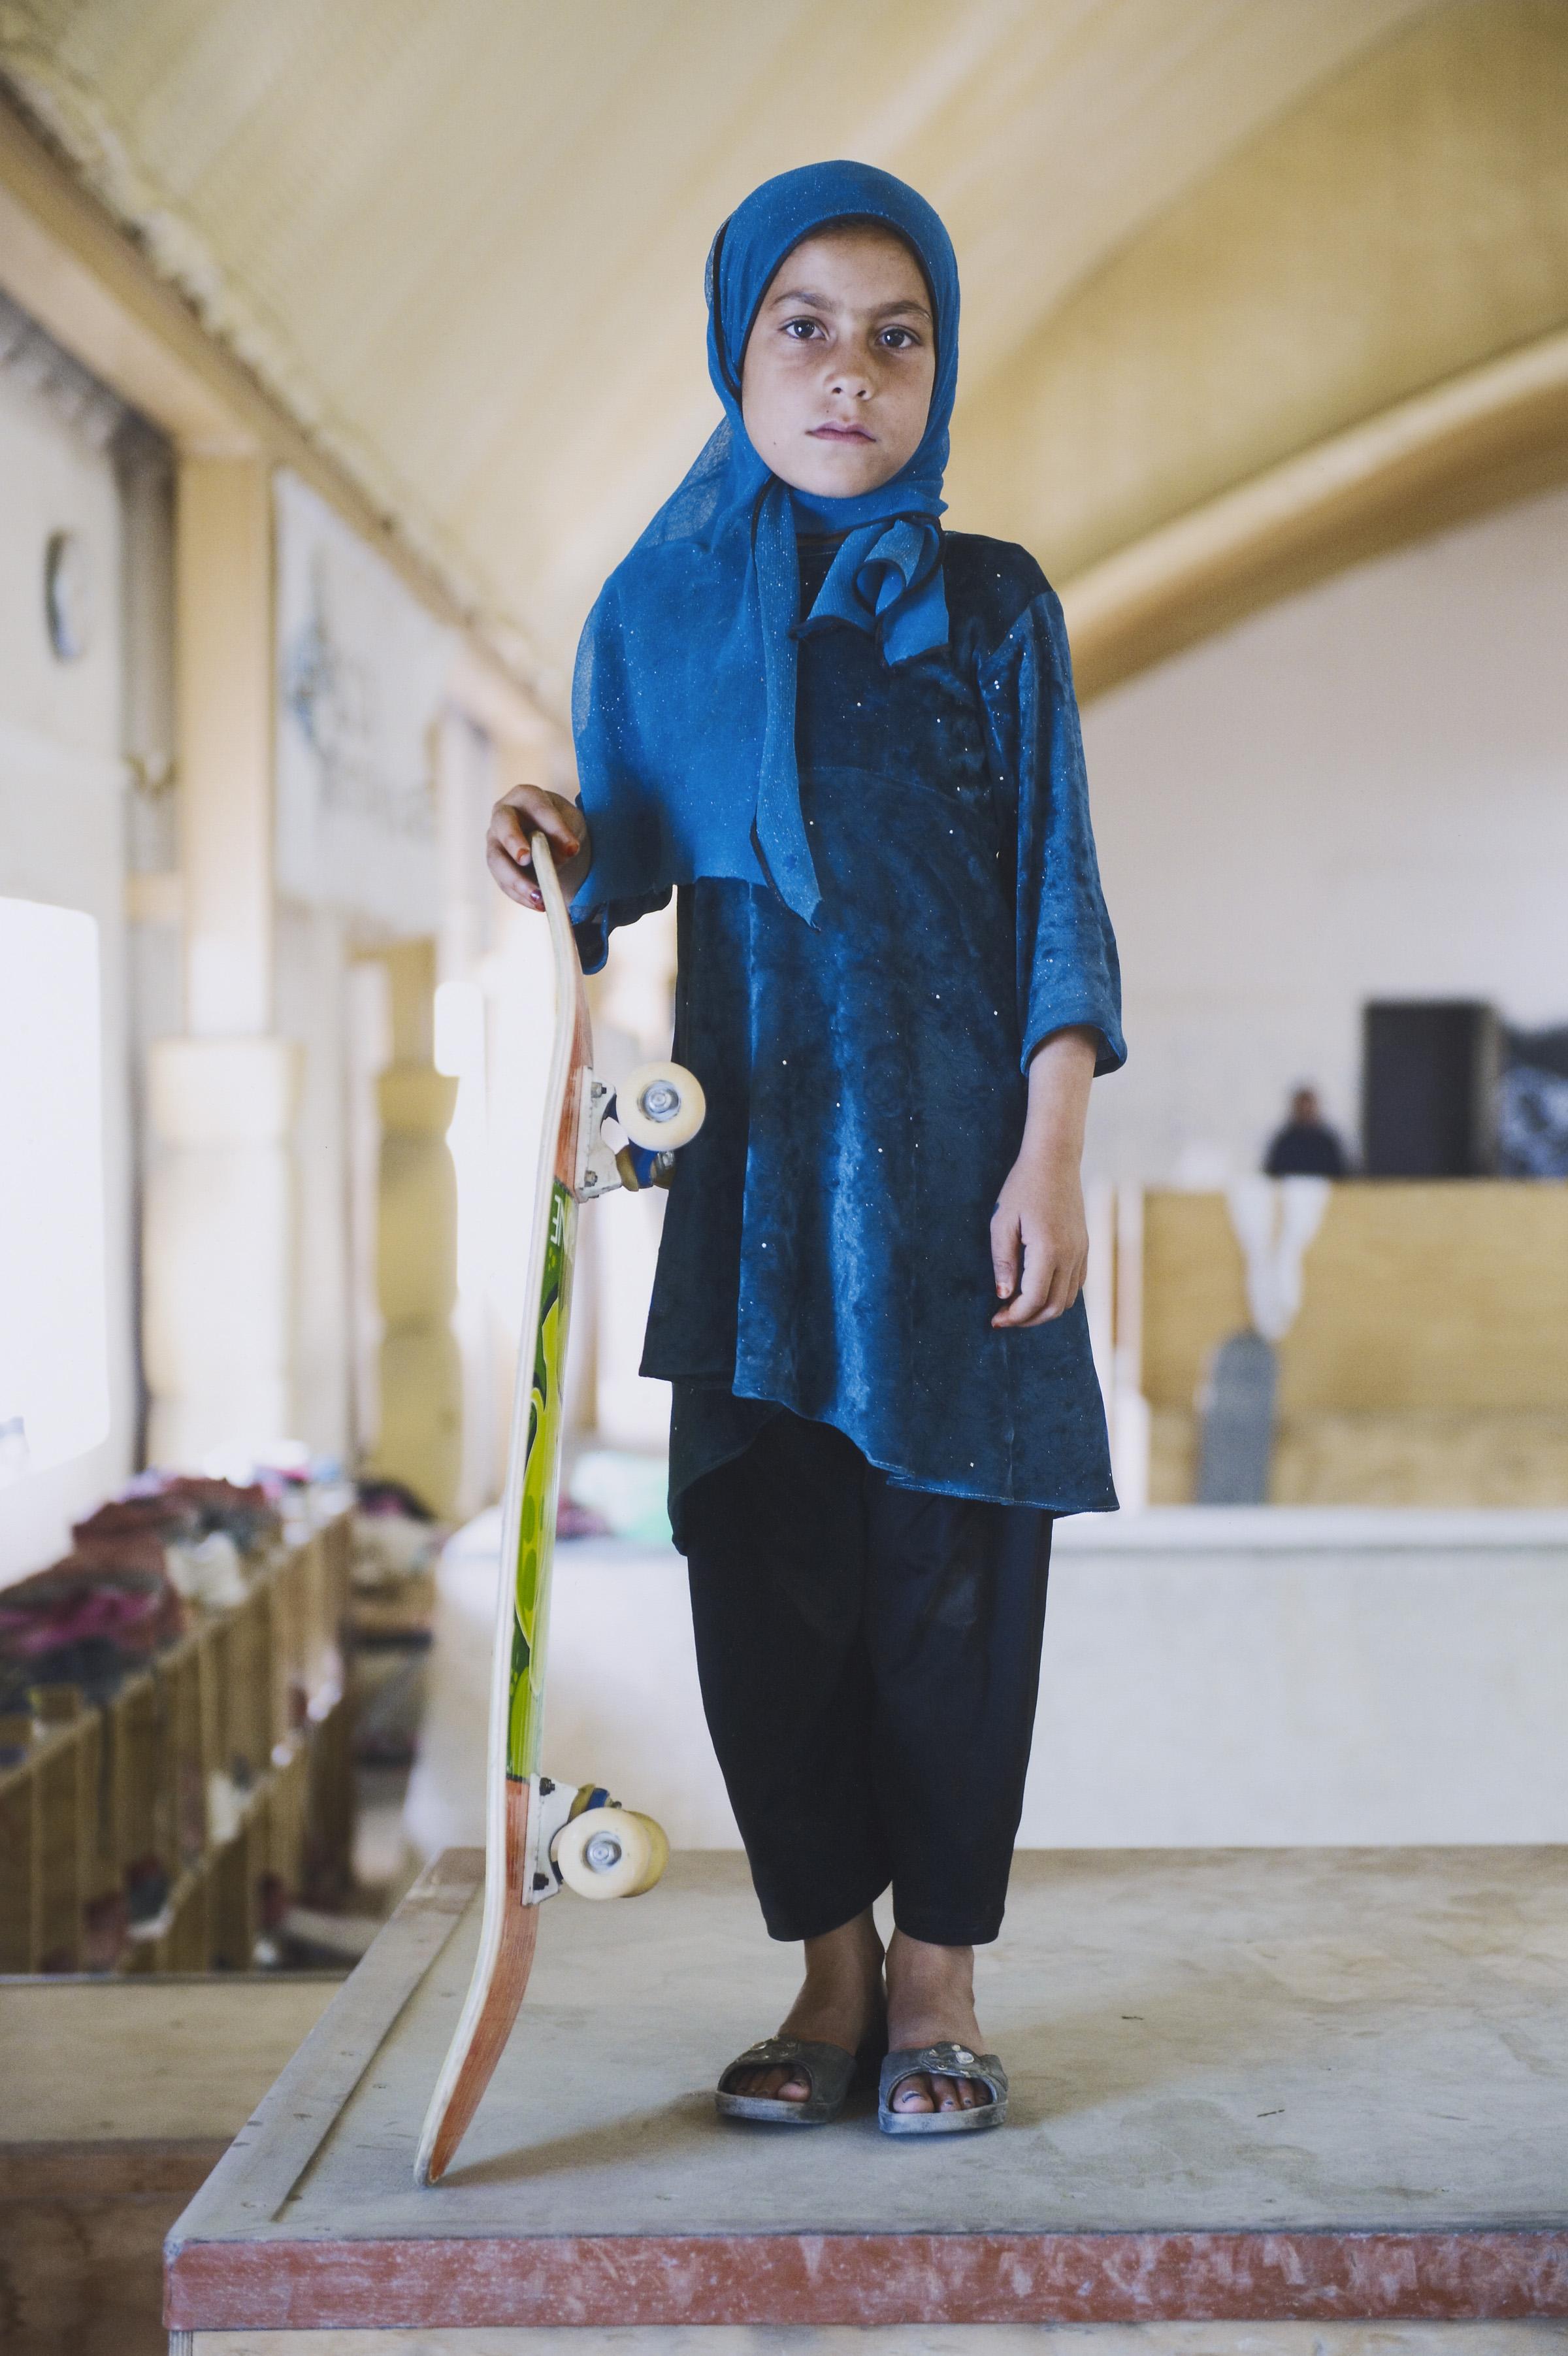 Skate Girl by Jessica Fulford-Dobson, 2014